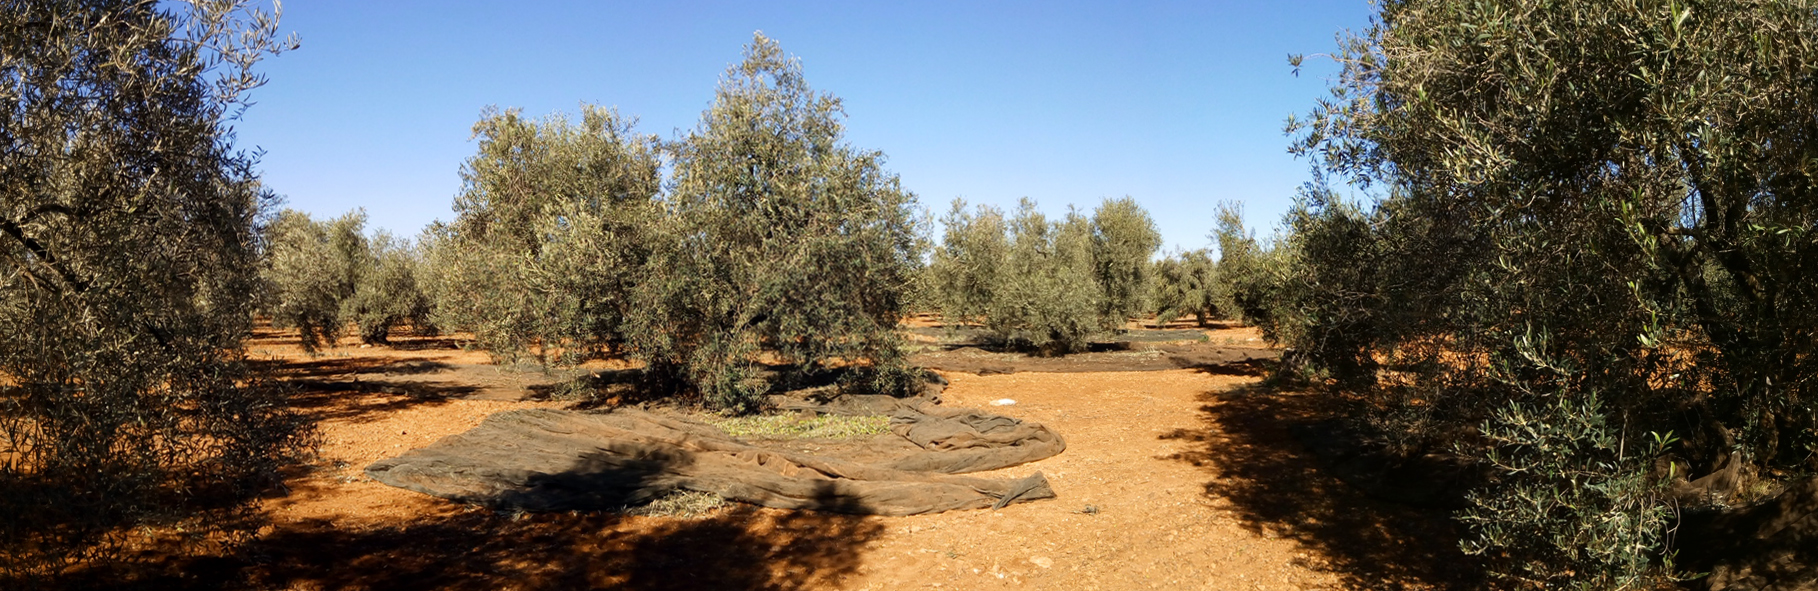 harvesting centenarian olive trees